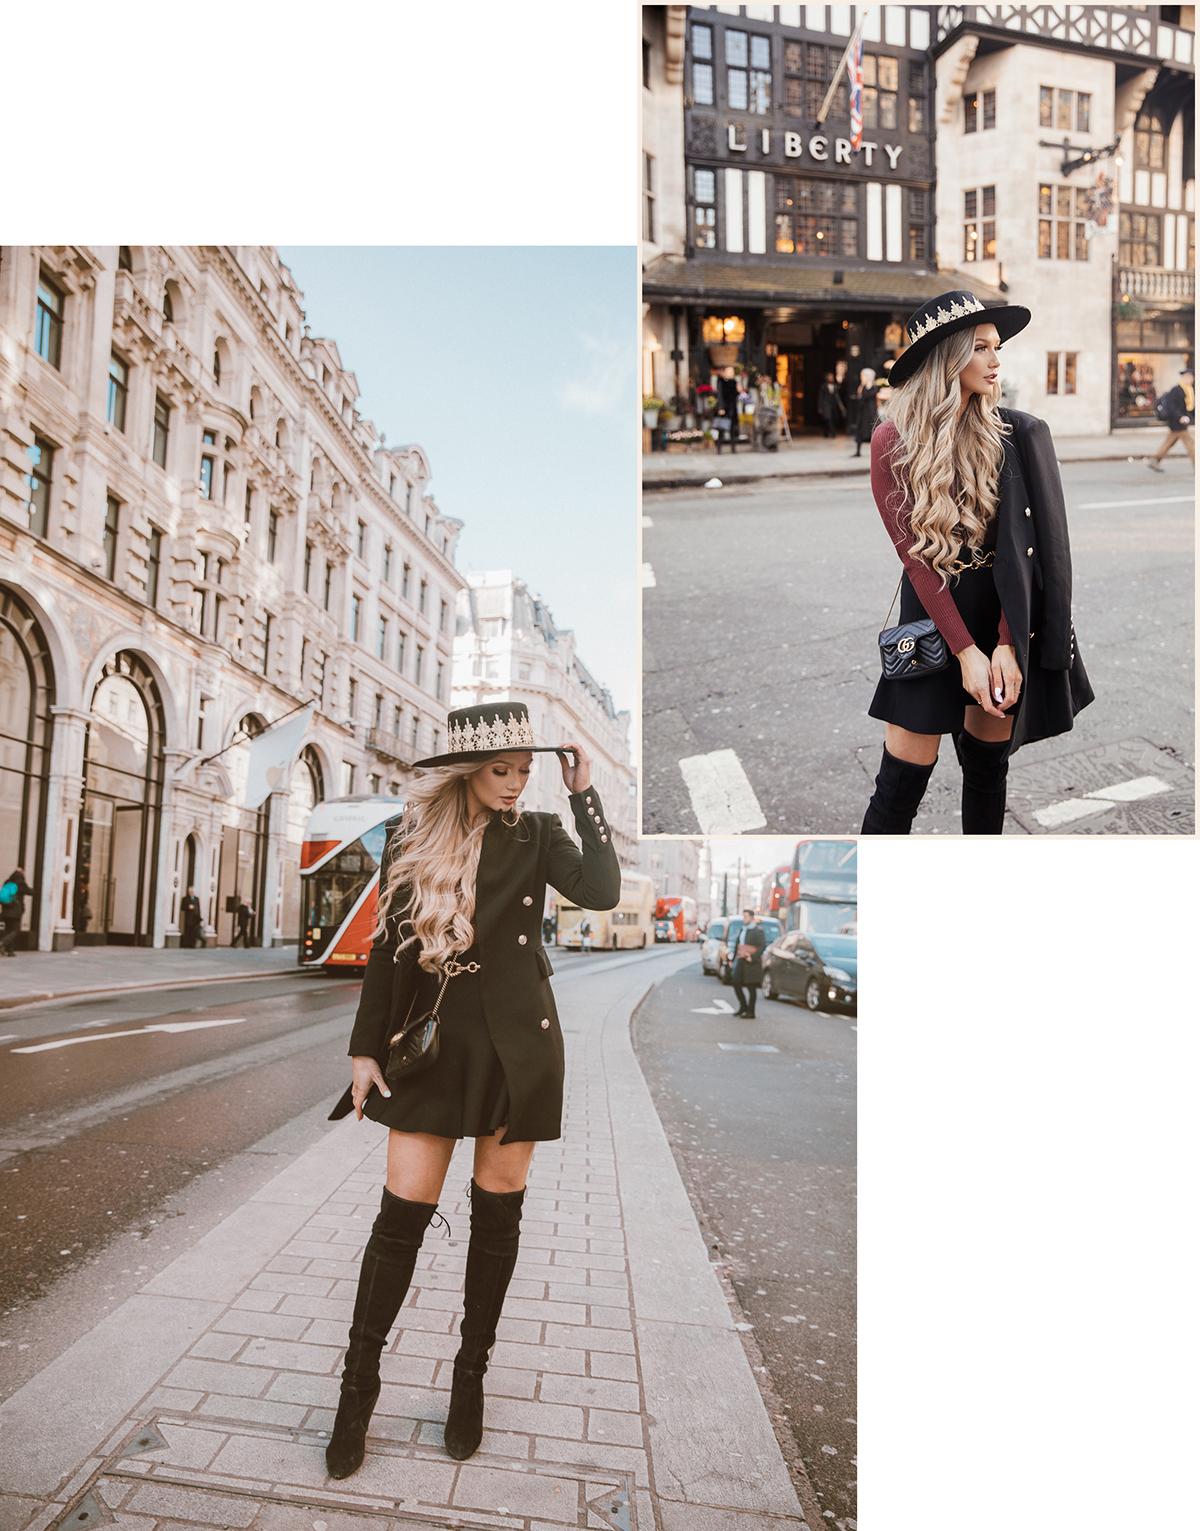 fashion blogger Stephanie Danielle photoshoot on Regent's street by London fashion photographer Ailera Stone